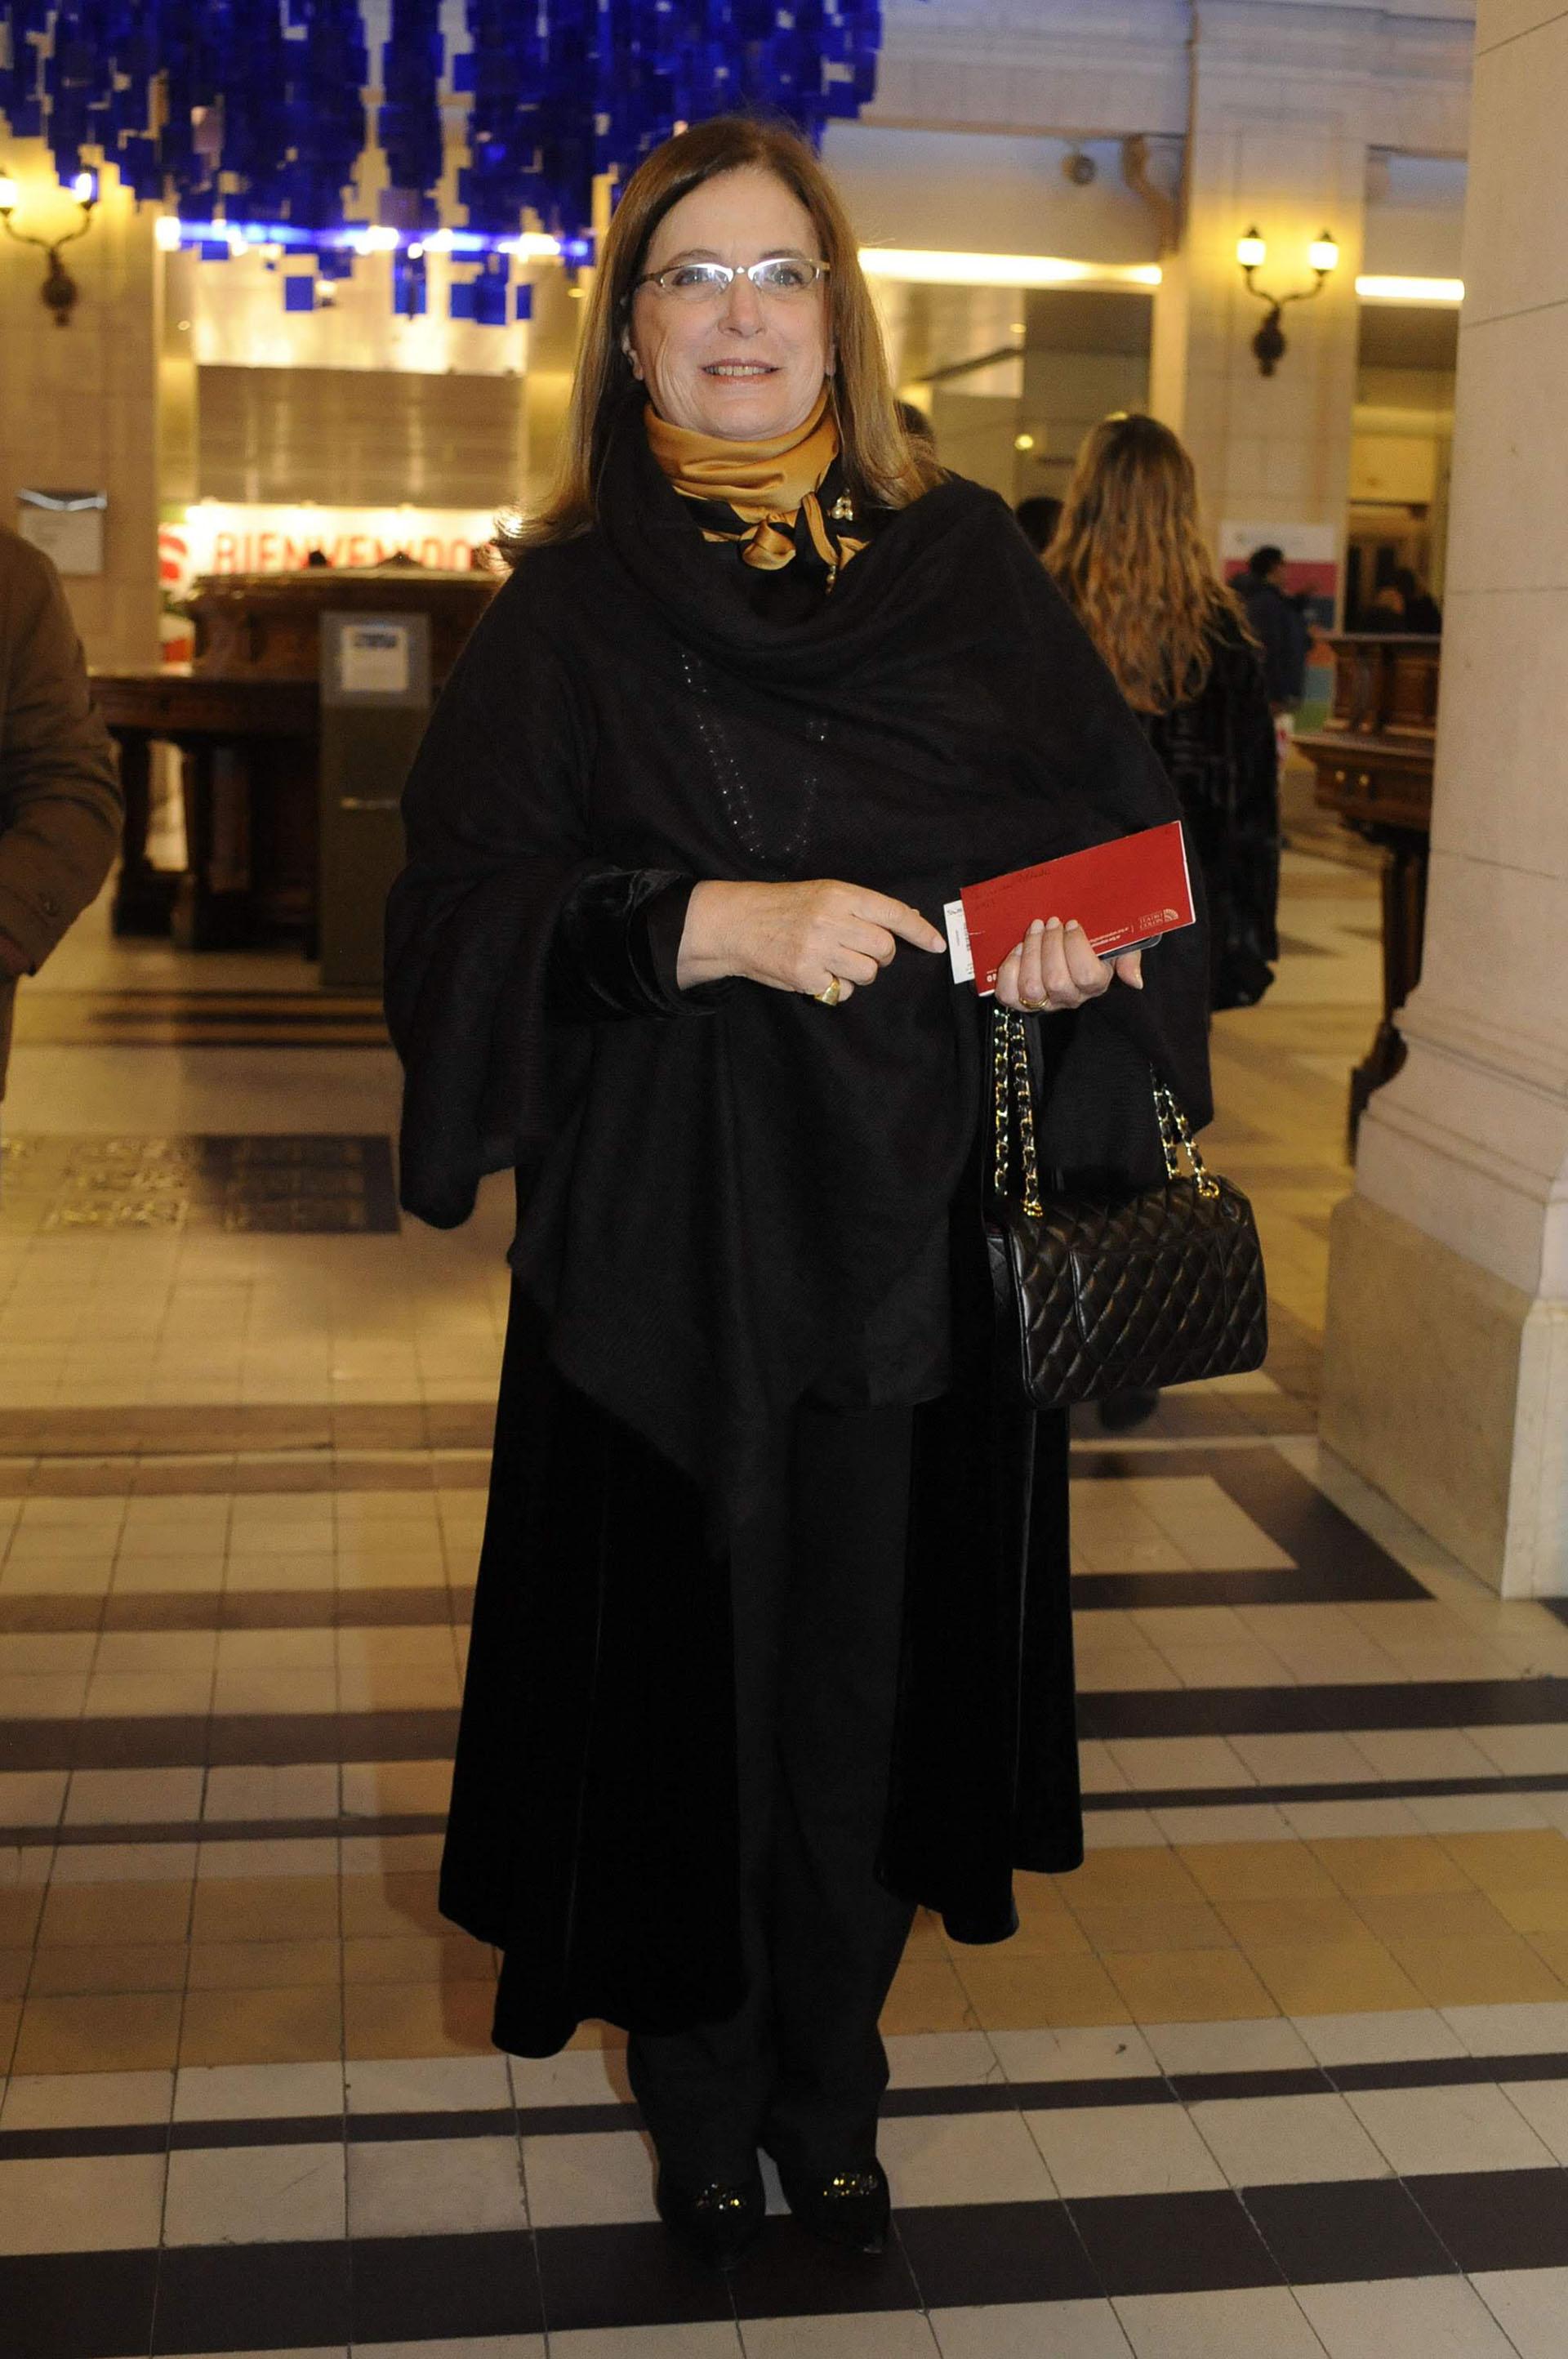 La diputada Carmen Polledo